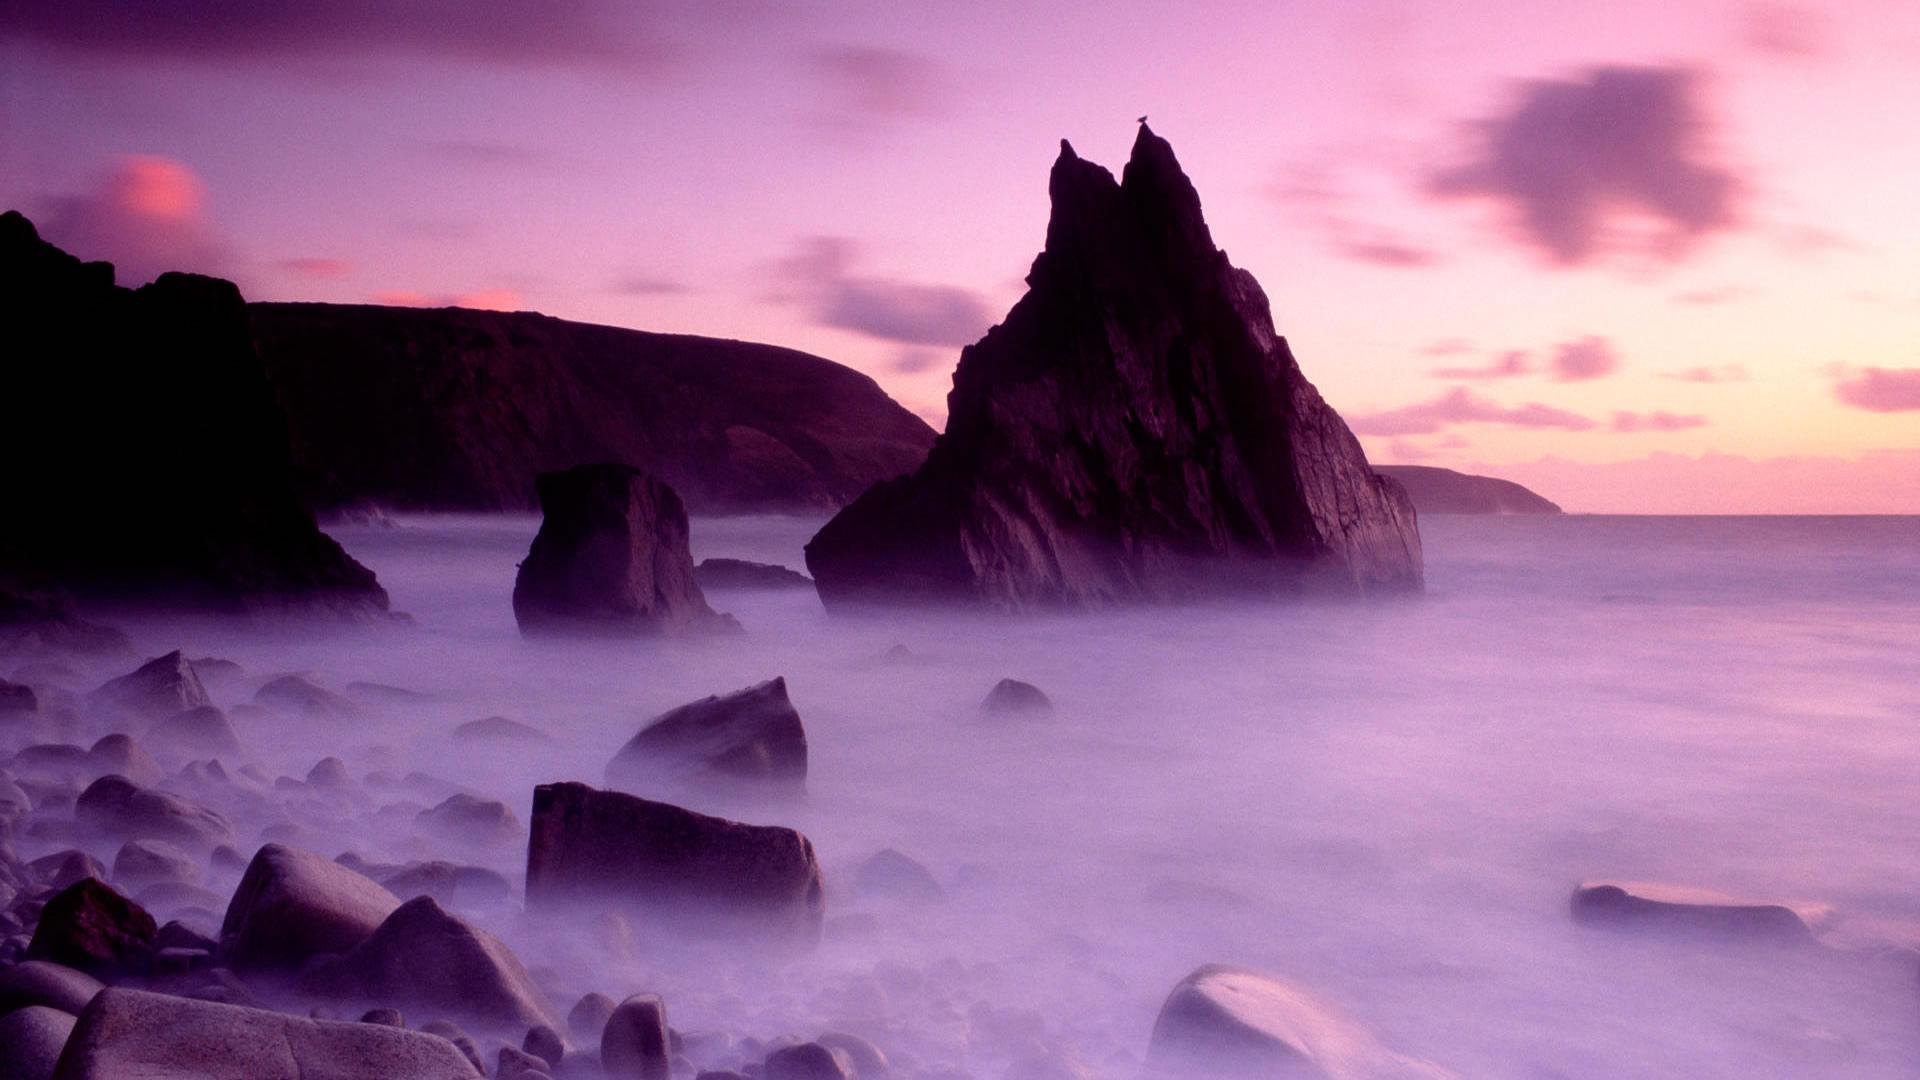 Ocean Mist 27426 2560x1600 px